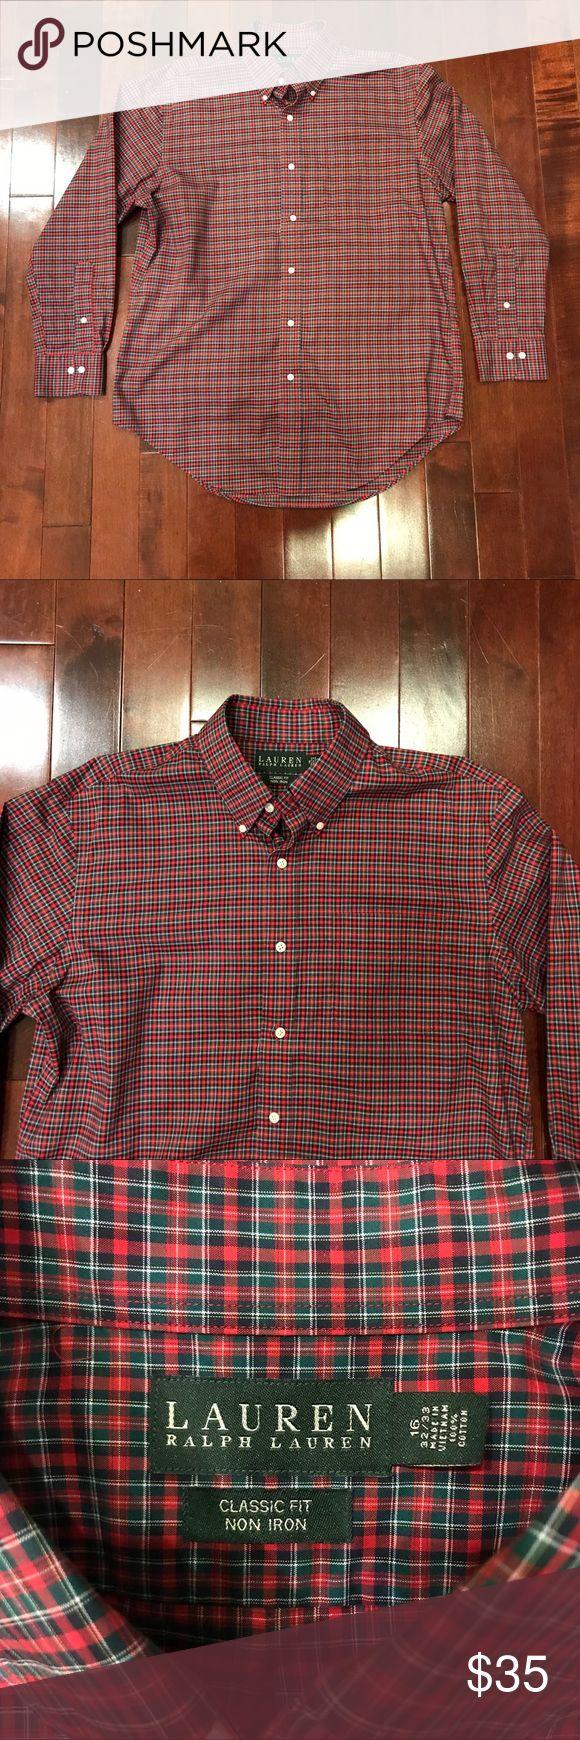 Lauren Ralph Lauren Classic Fit Non Iron Shirt Great condition!  Classic fit.  Non iron.  Cotton.  Size is 16 32/33. Lauren Ralph Lauren Shirts Dress Shirts